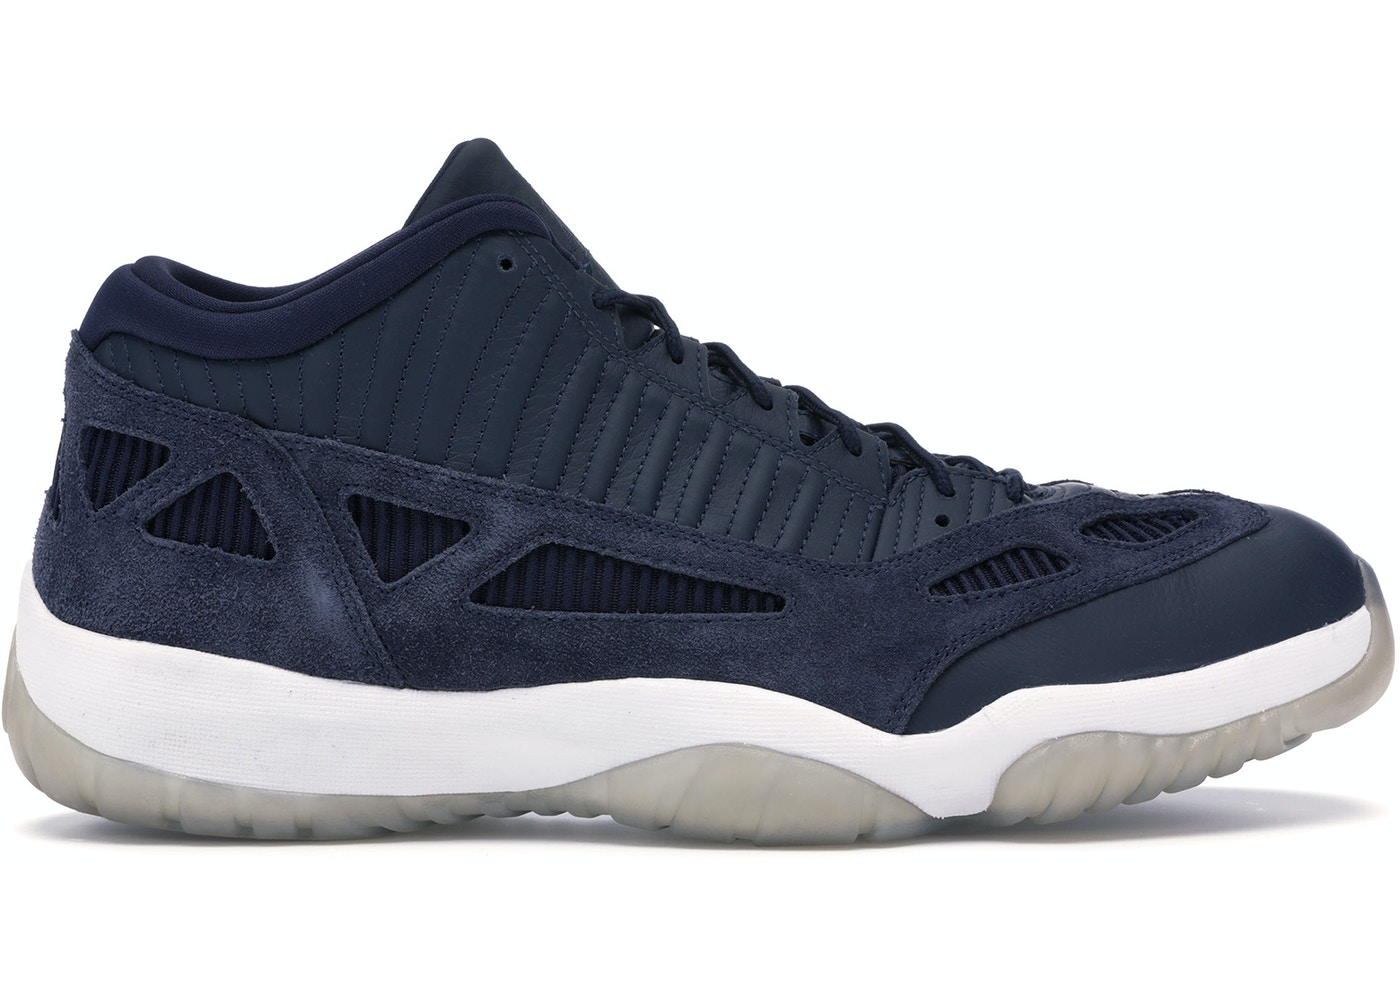 4afdf13fa56344 Buy Air Jordan 11 Size 17 Shoes   Deadstock Sneakers